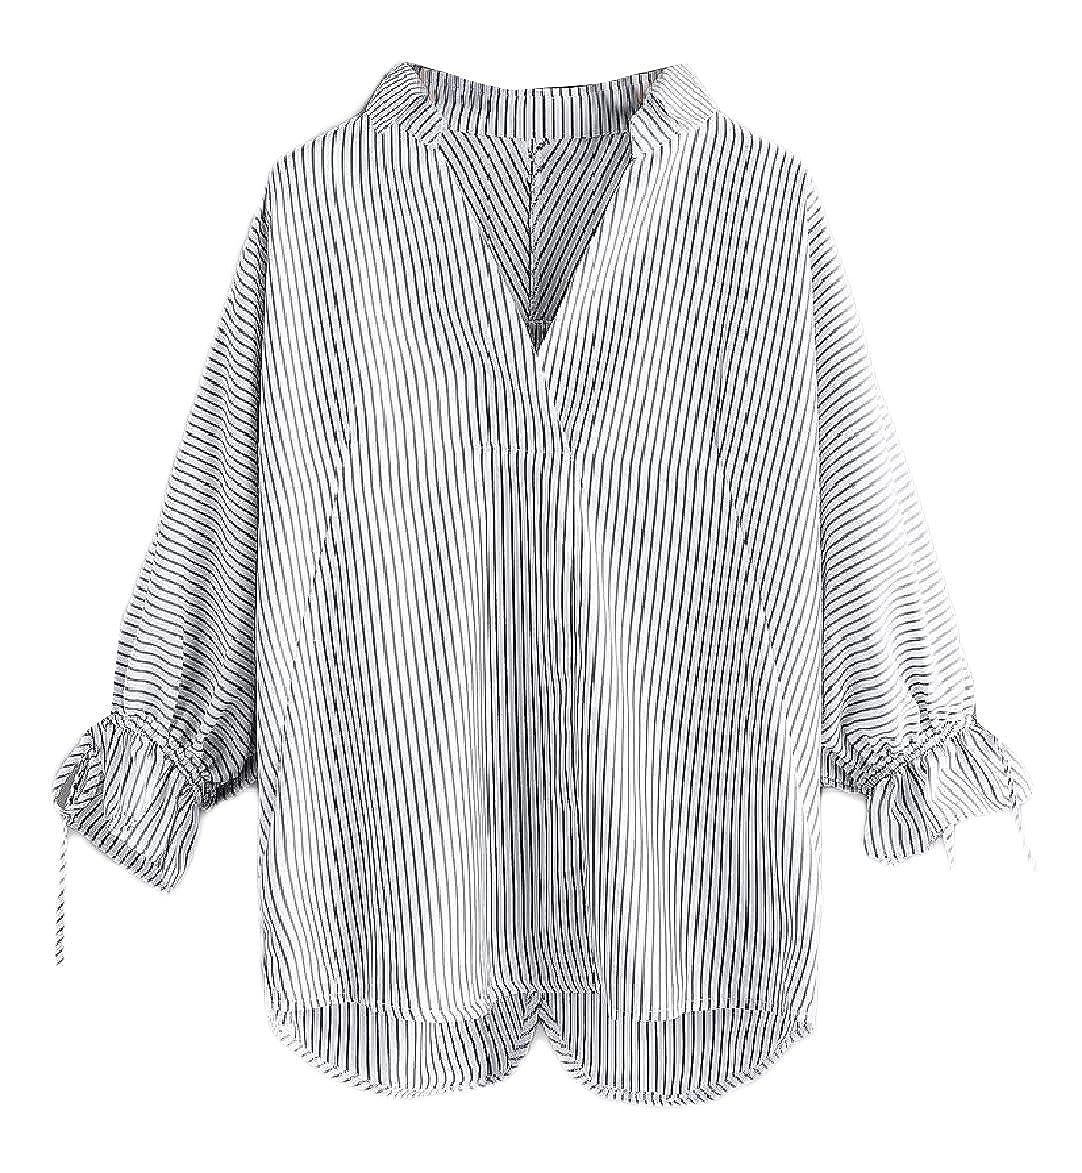 a6d0131af9d320 Fseason-Women V-Neck Pinstripe Stylish Long-Sleeve Drawstring Blouse Shirt  at Amazon Women's Clothing store: